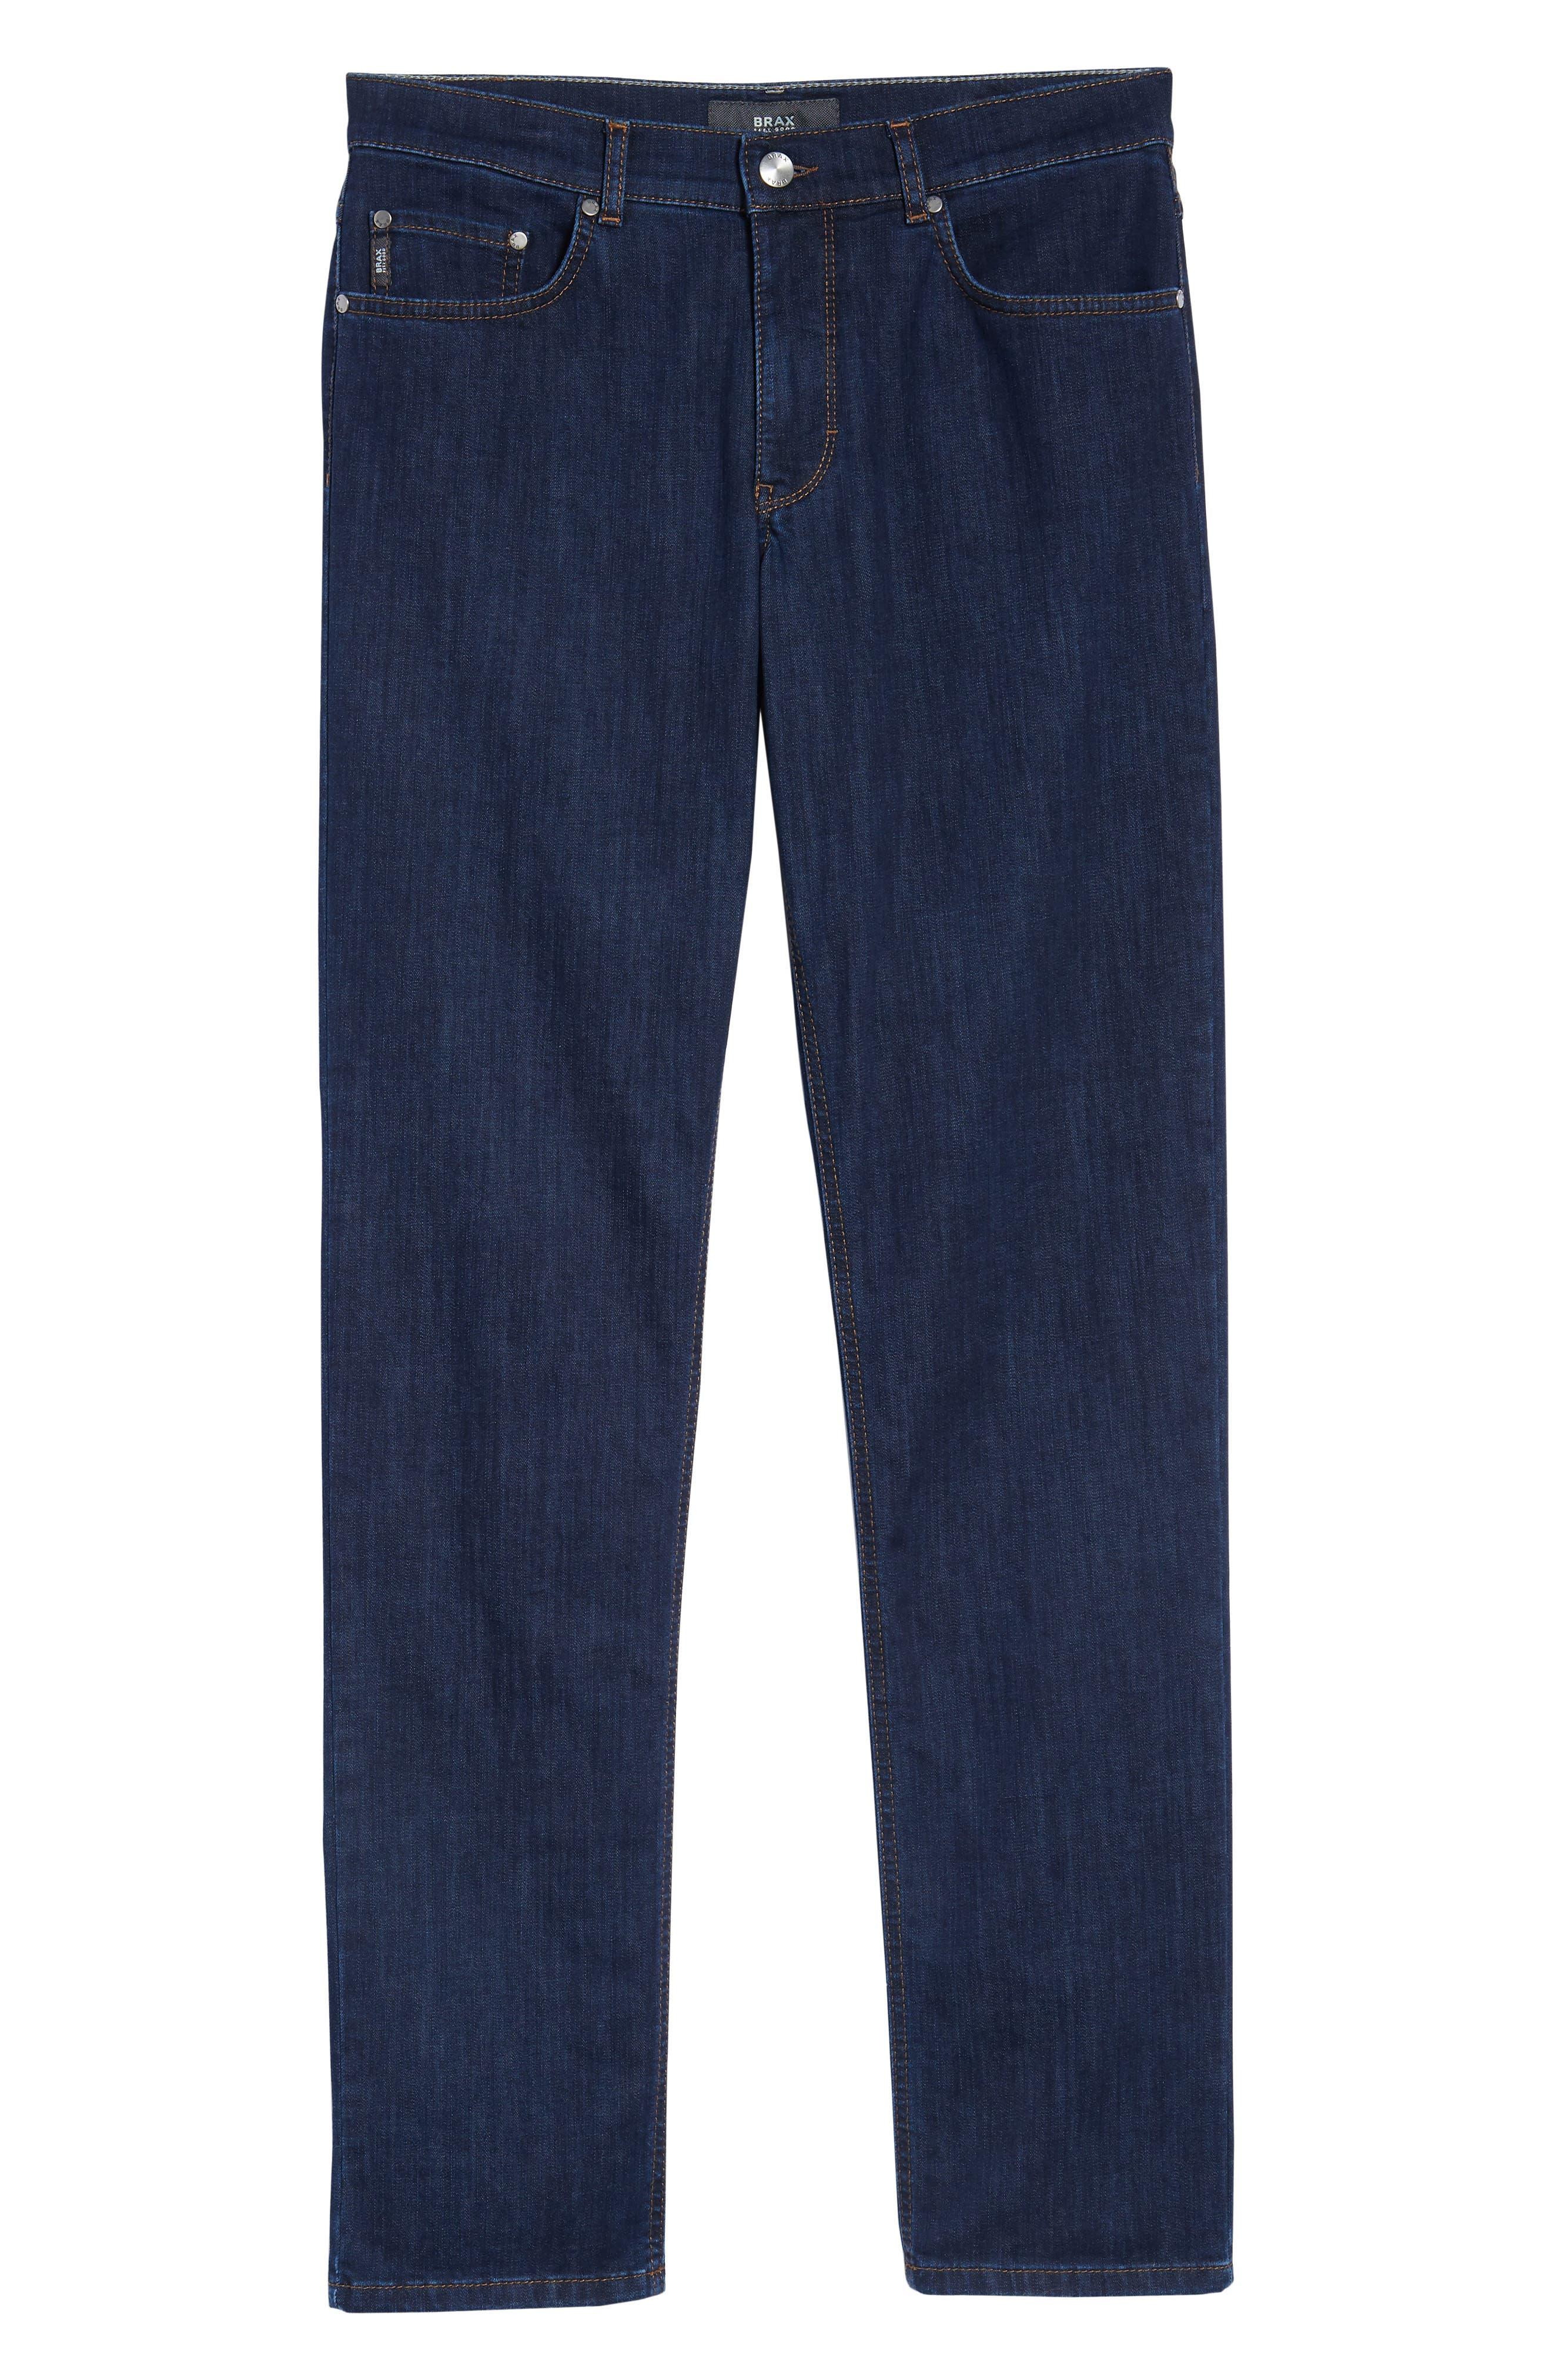 Masterpiece Regular Jeans,                             Alternate thumbnail 17, color,